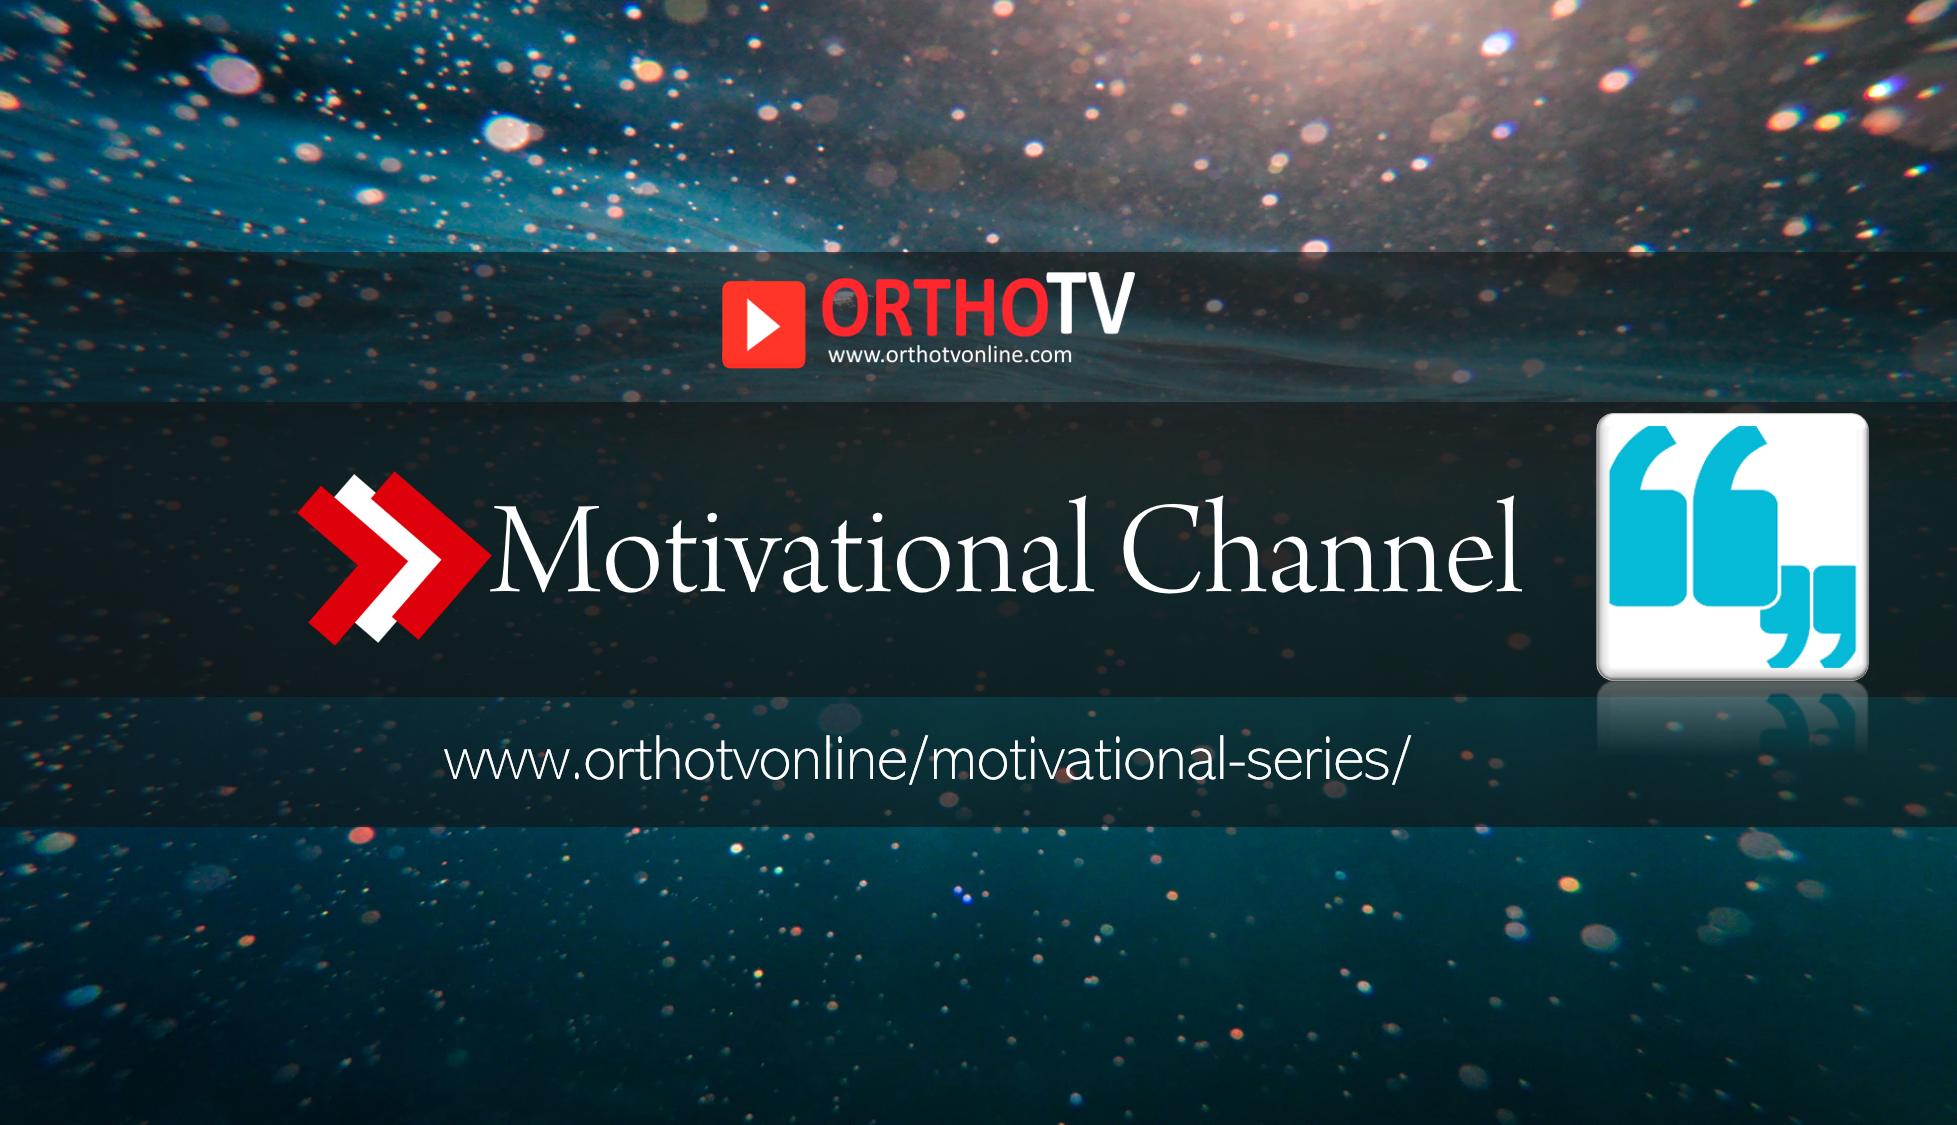 - OrthoTV Motivational Channel - Motivational Series